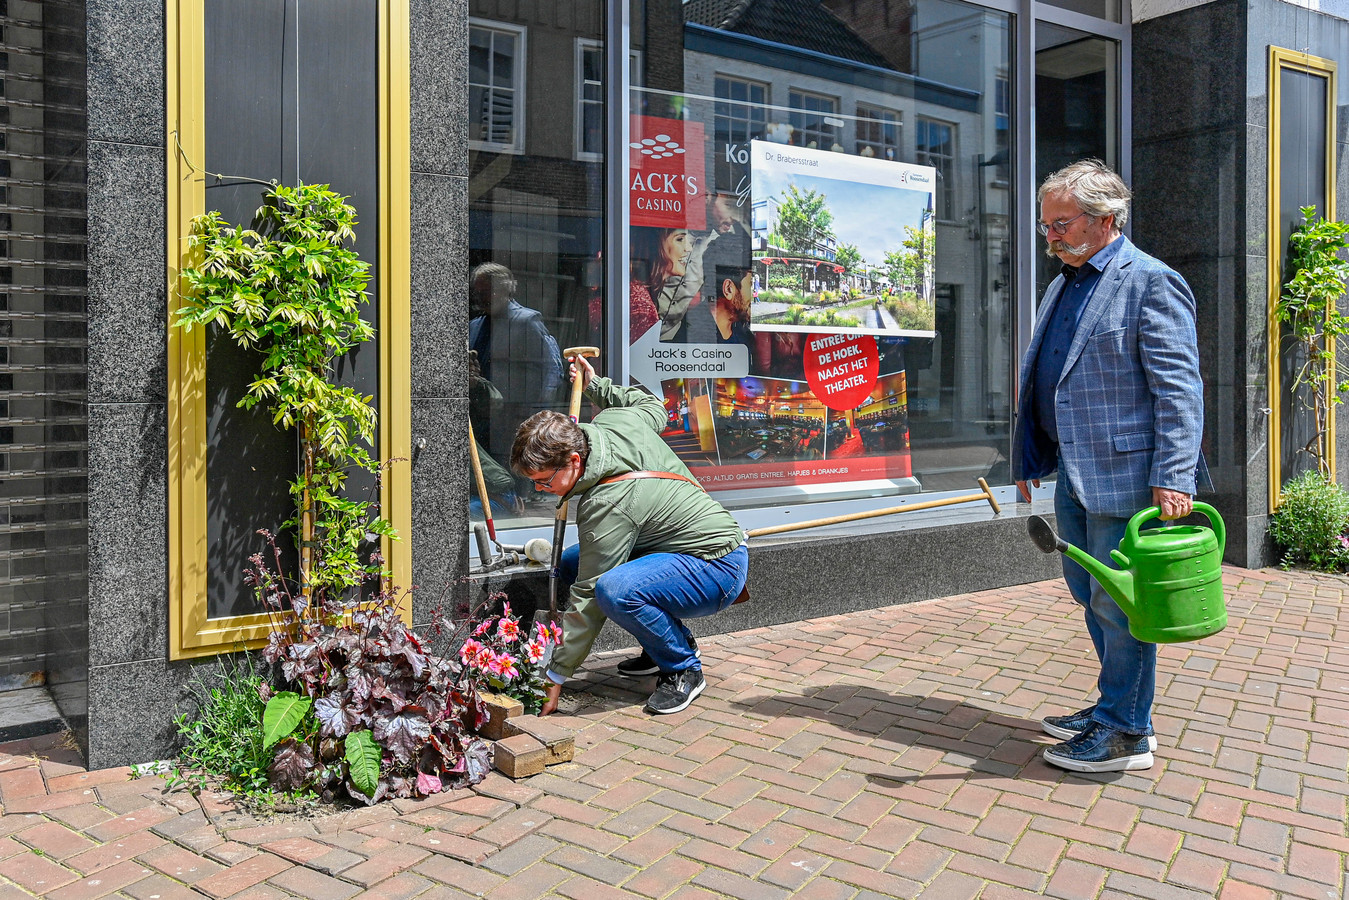 De Raadhuisstraat in Roosendaal is vergroend met geveltuintjes. Wethouder Inge Raaijmakers plant, wethouder Cees Lok staat klaar met de gieter.